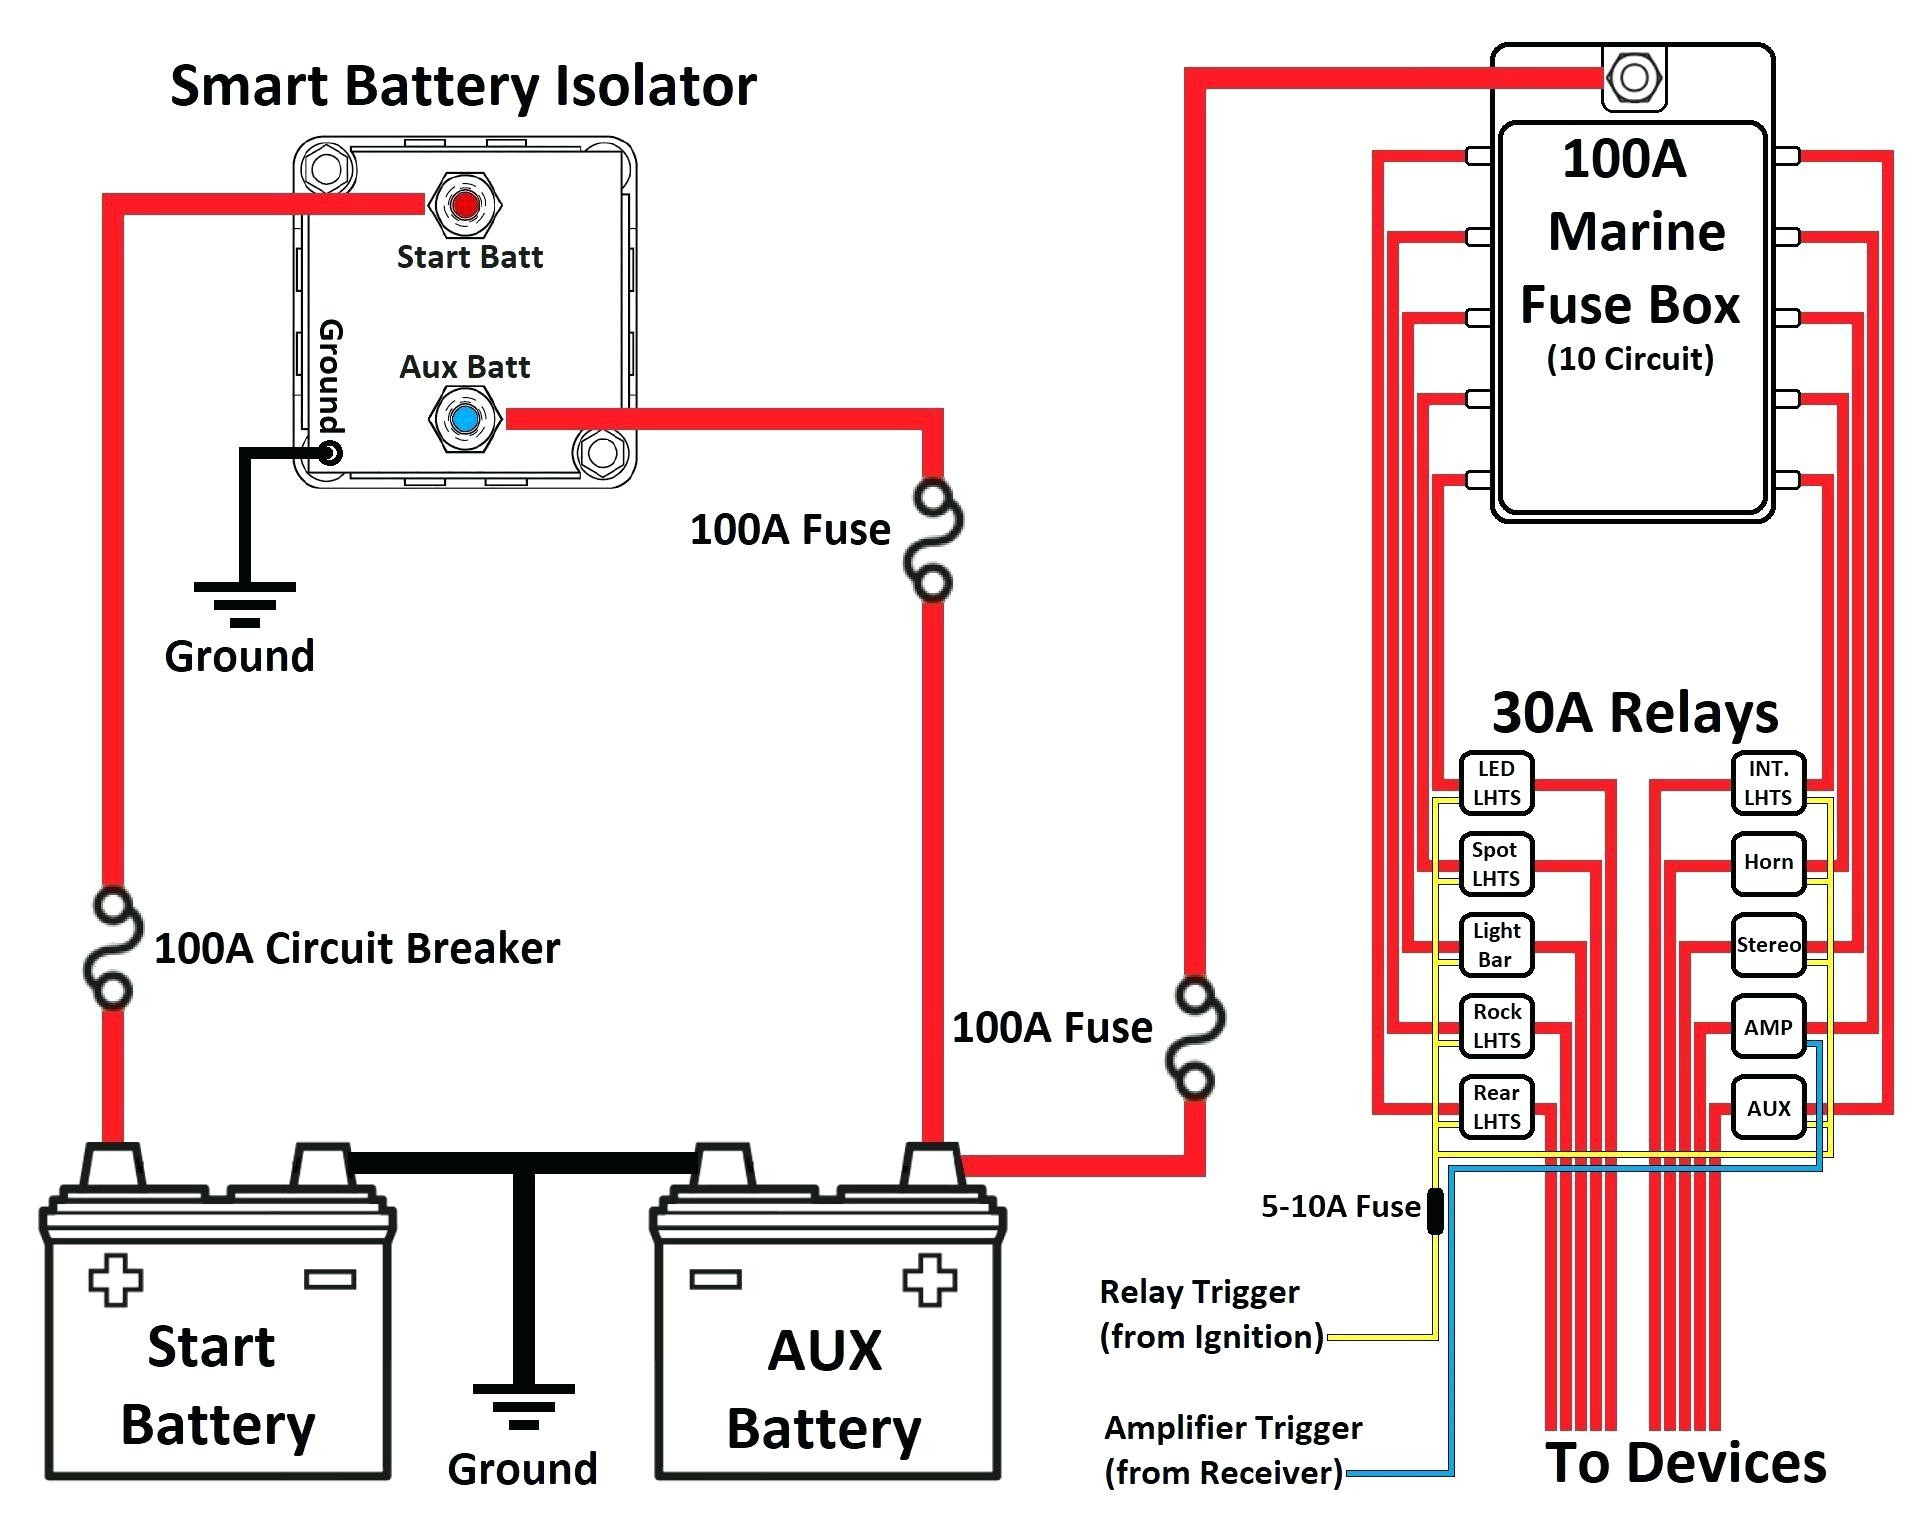 true battery isolator wiring diagram Collection-true battery isolator wiring diagram Download dual battery isolator wiring diagram Collection Boat Dual Battery DOWNLOAD Wiring Diagram 2-s